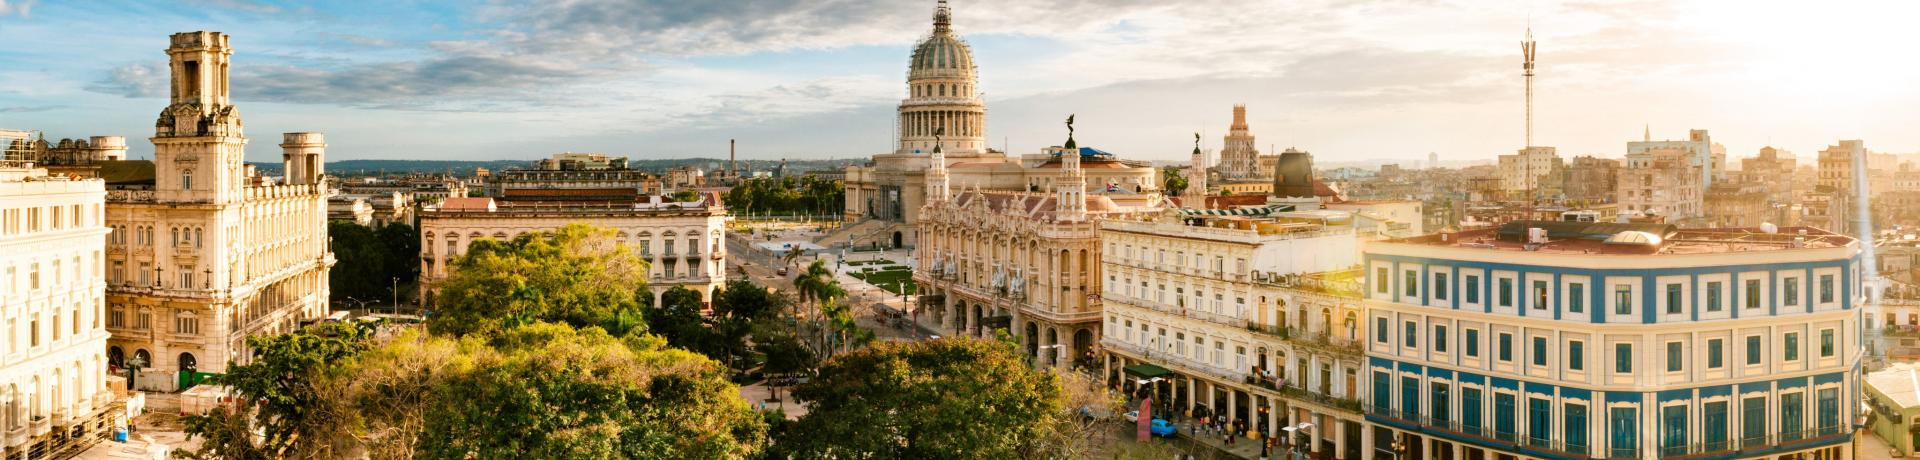 4006+Kuba+Havanna+GI-639866730.jpg